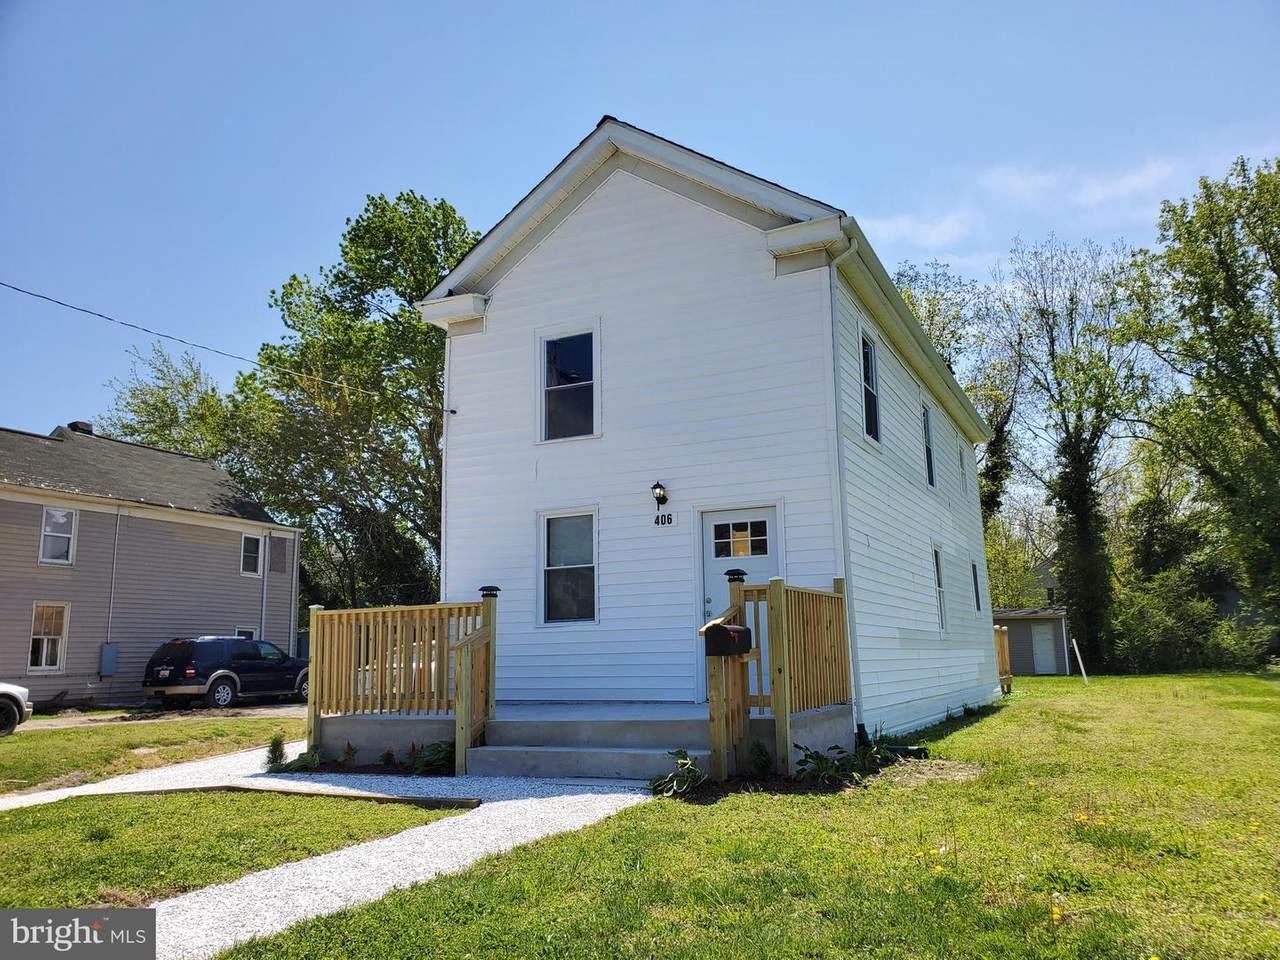 406 Cedar Street - Photo 1